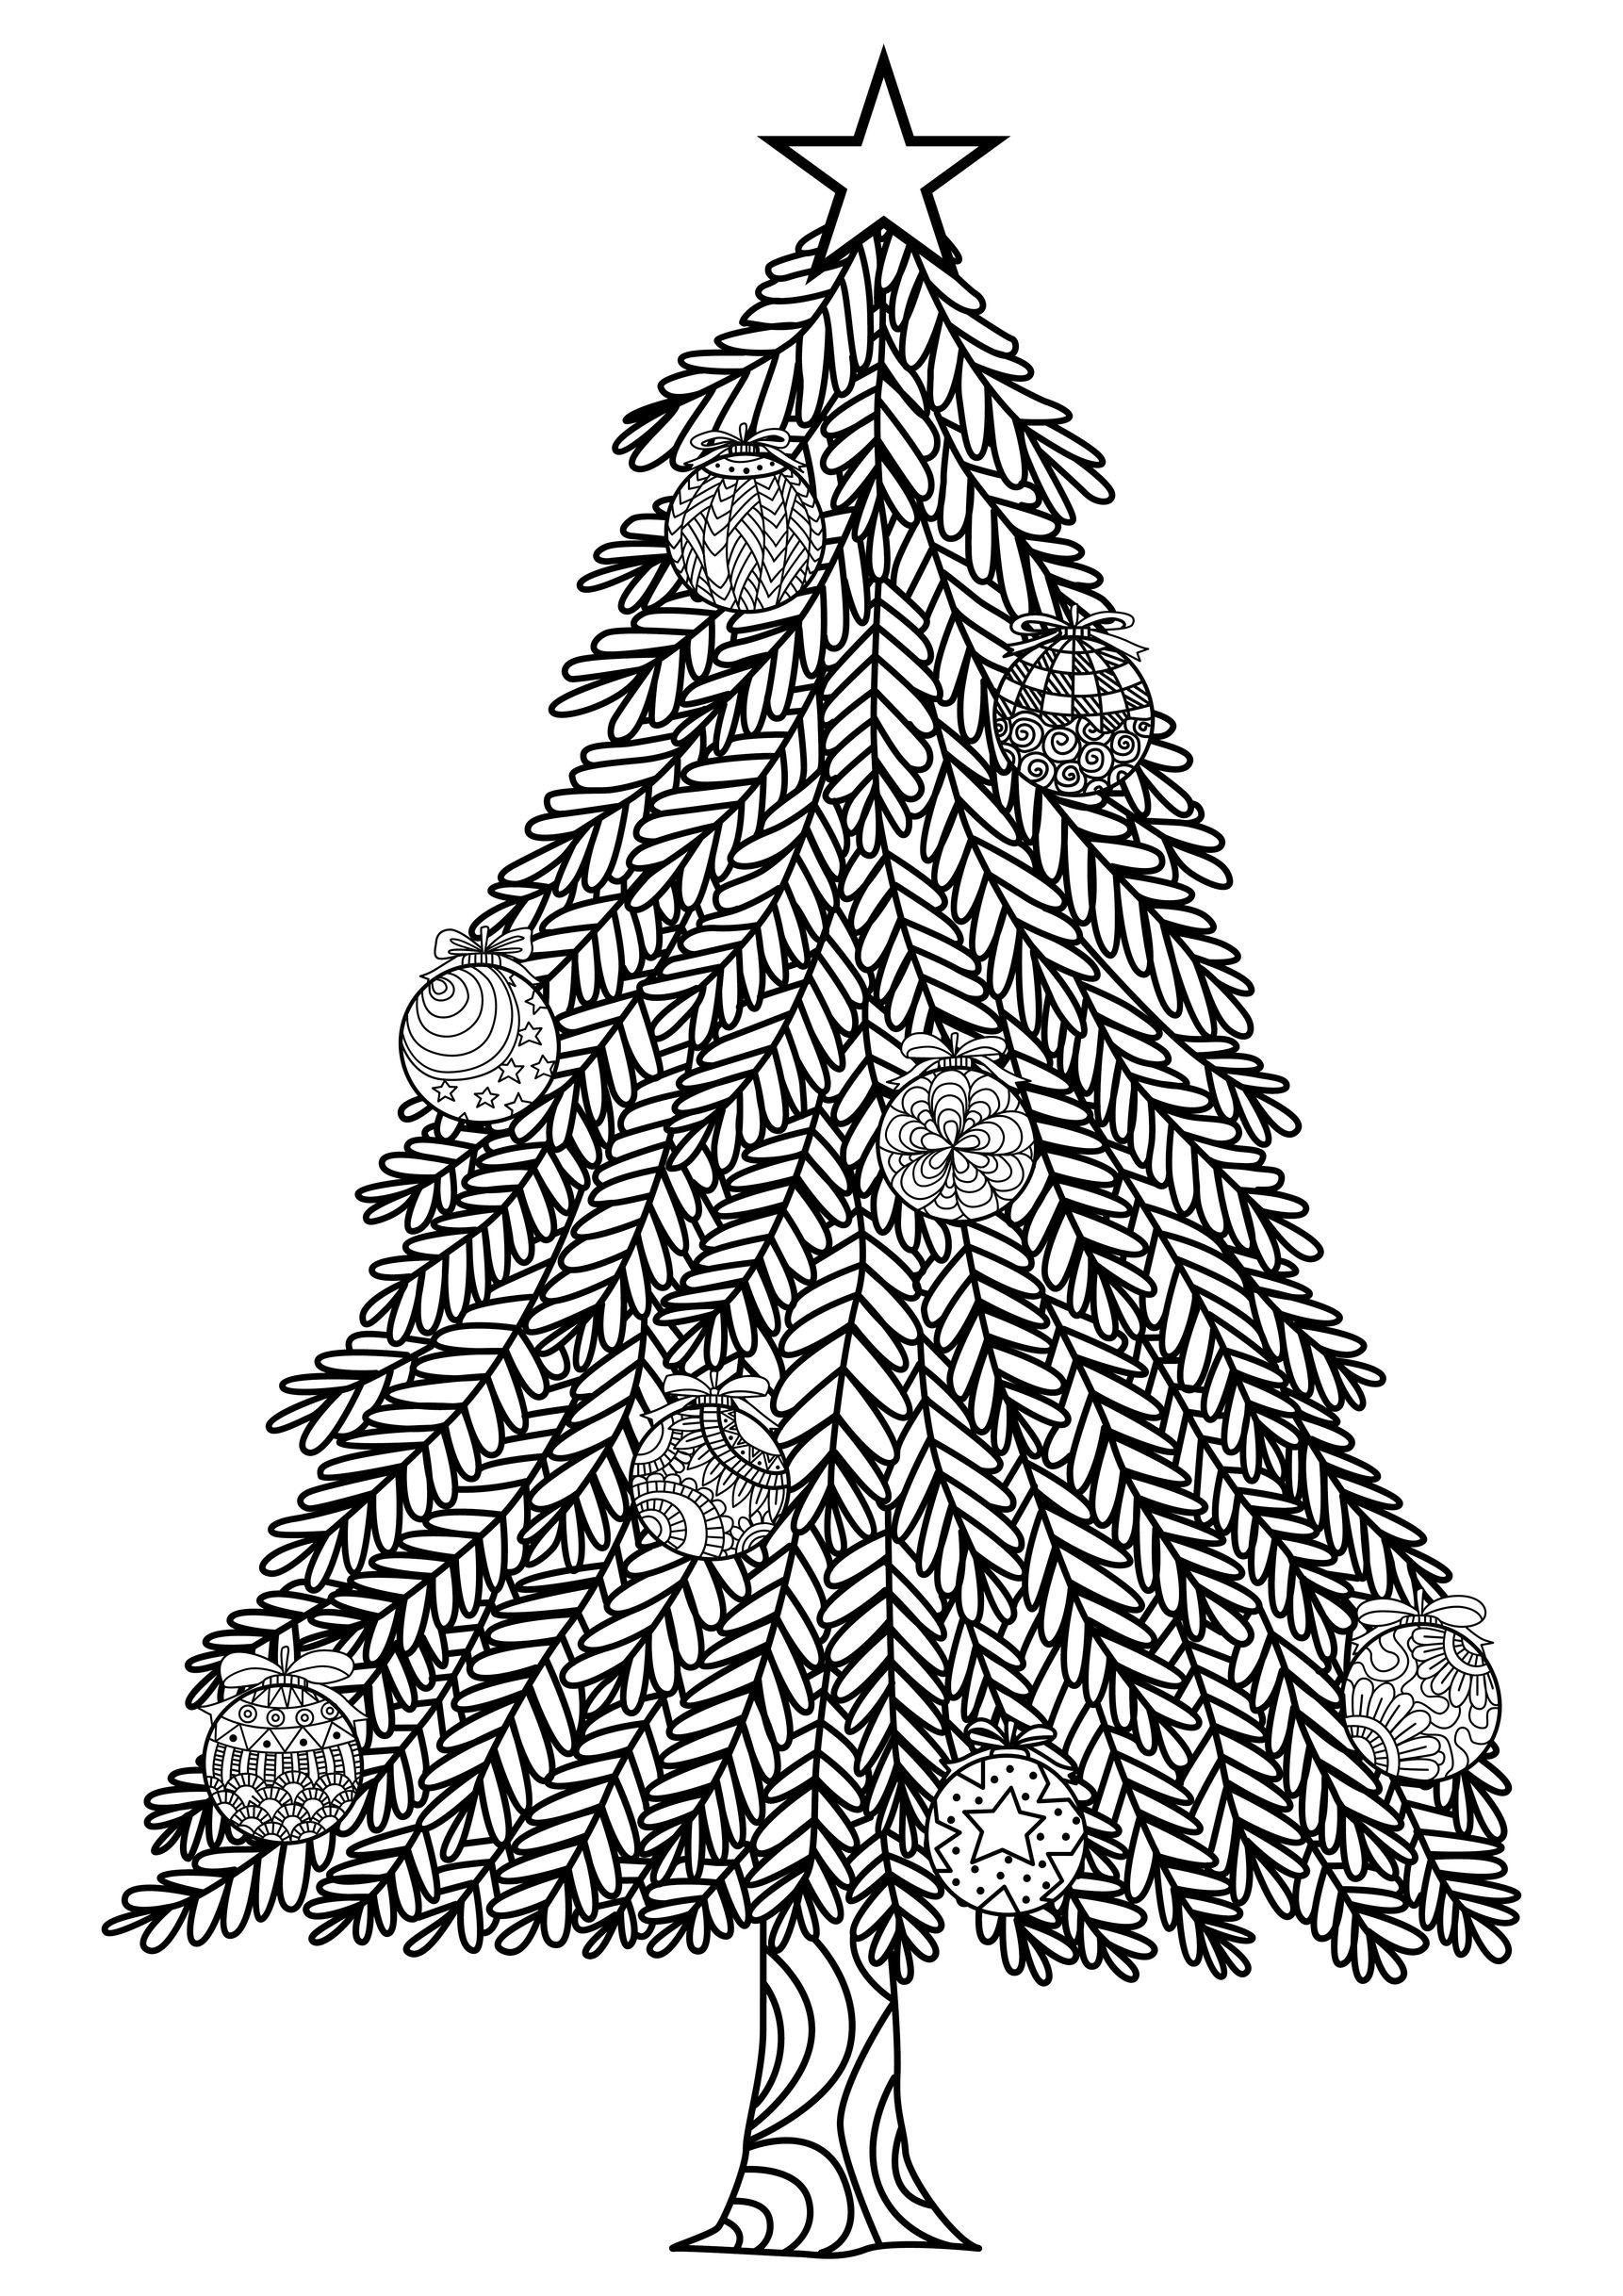 Christmas Tree With Ball Ornaments By Bimdeedee Christmas